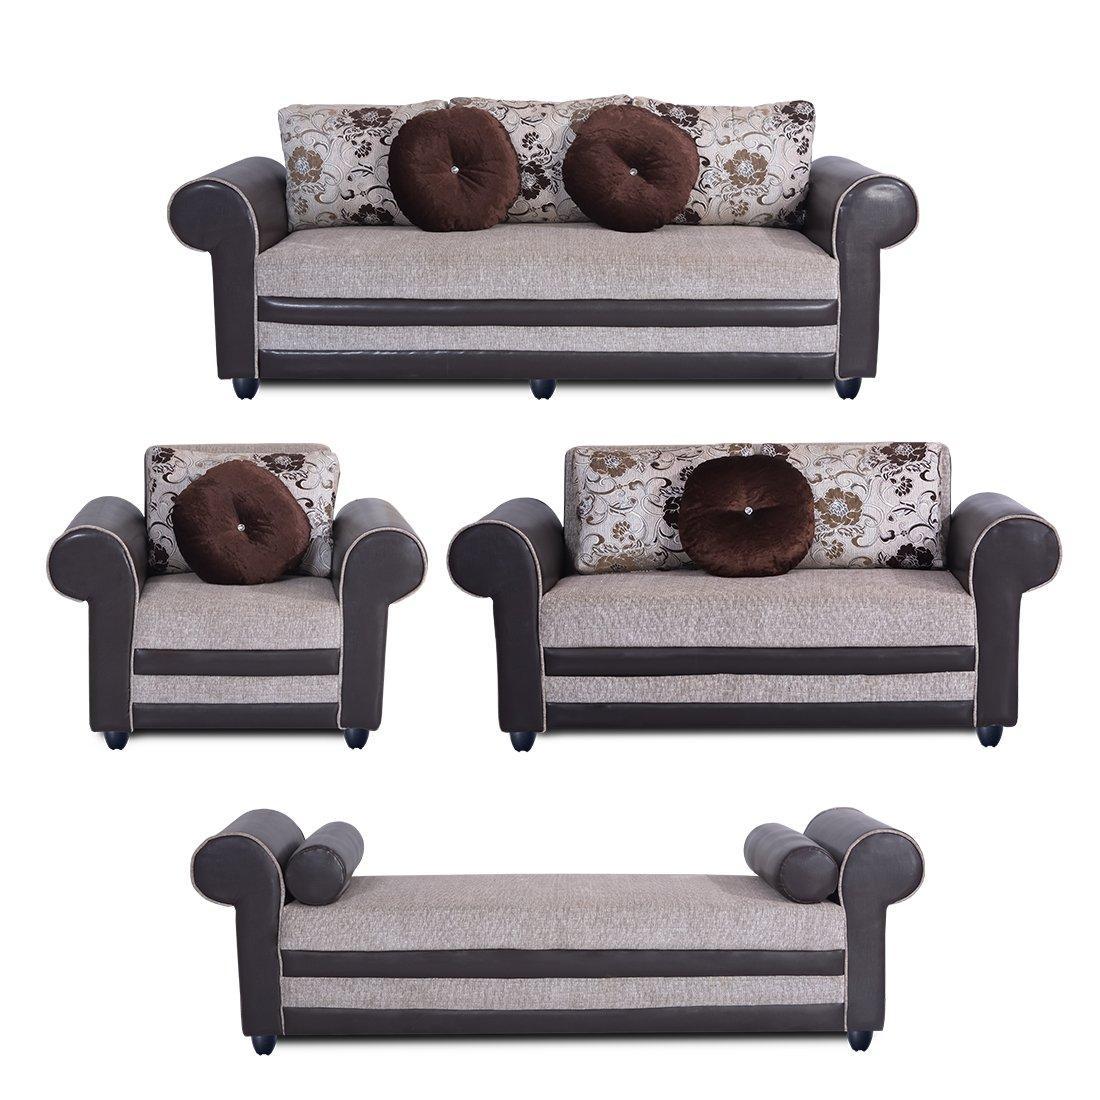 Leatherette Cream Brown Sofa Set